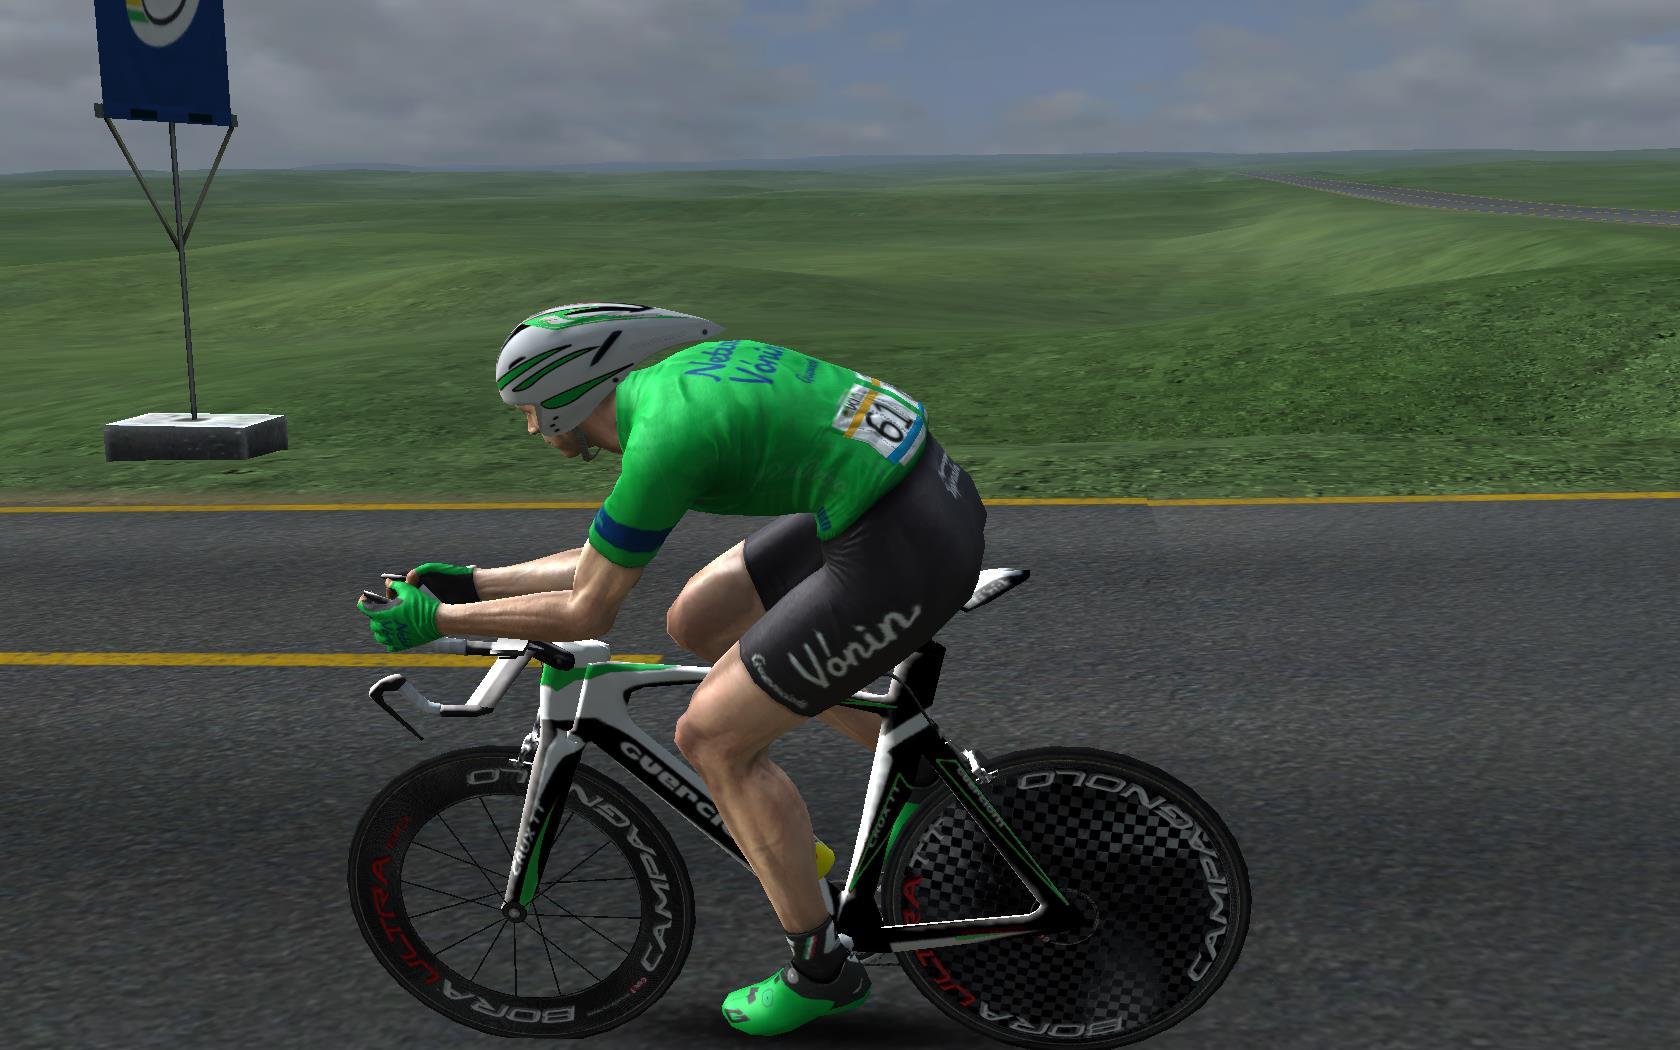 pcmdaily.com/images/mg/2018/Races/C2/USAPCC/4/PCM0026.jpg